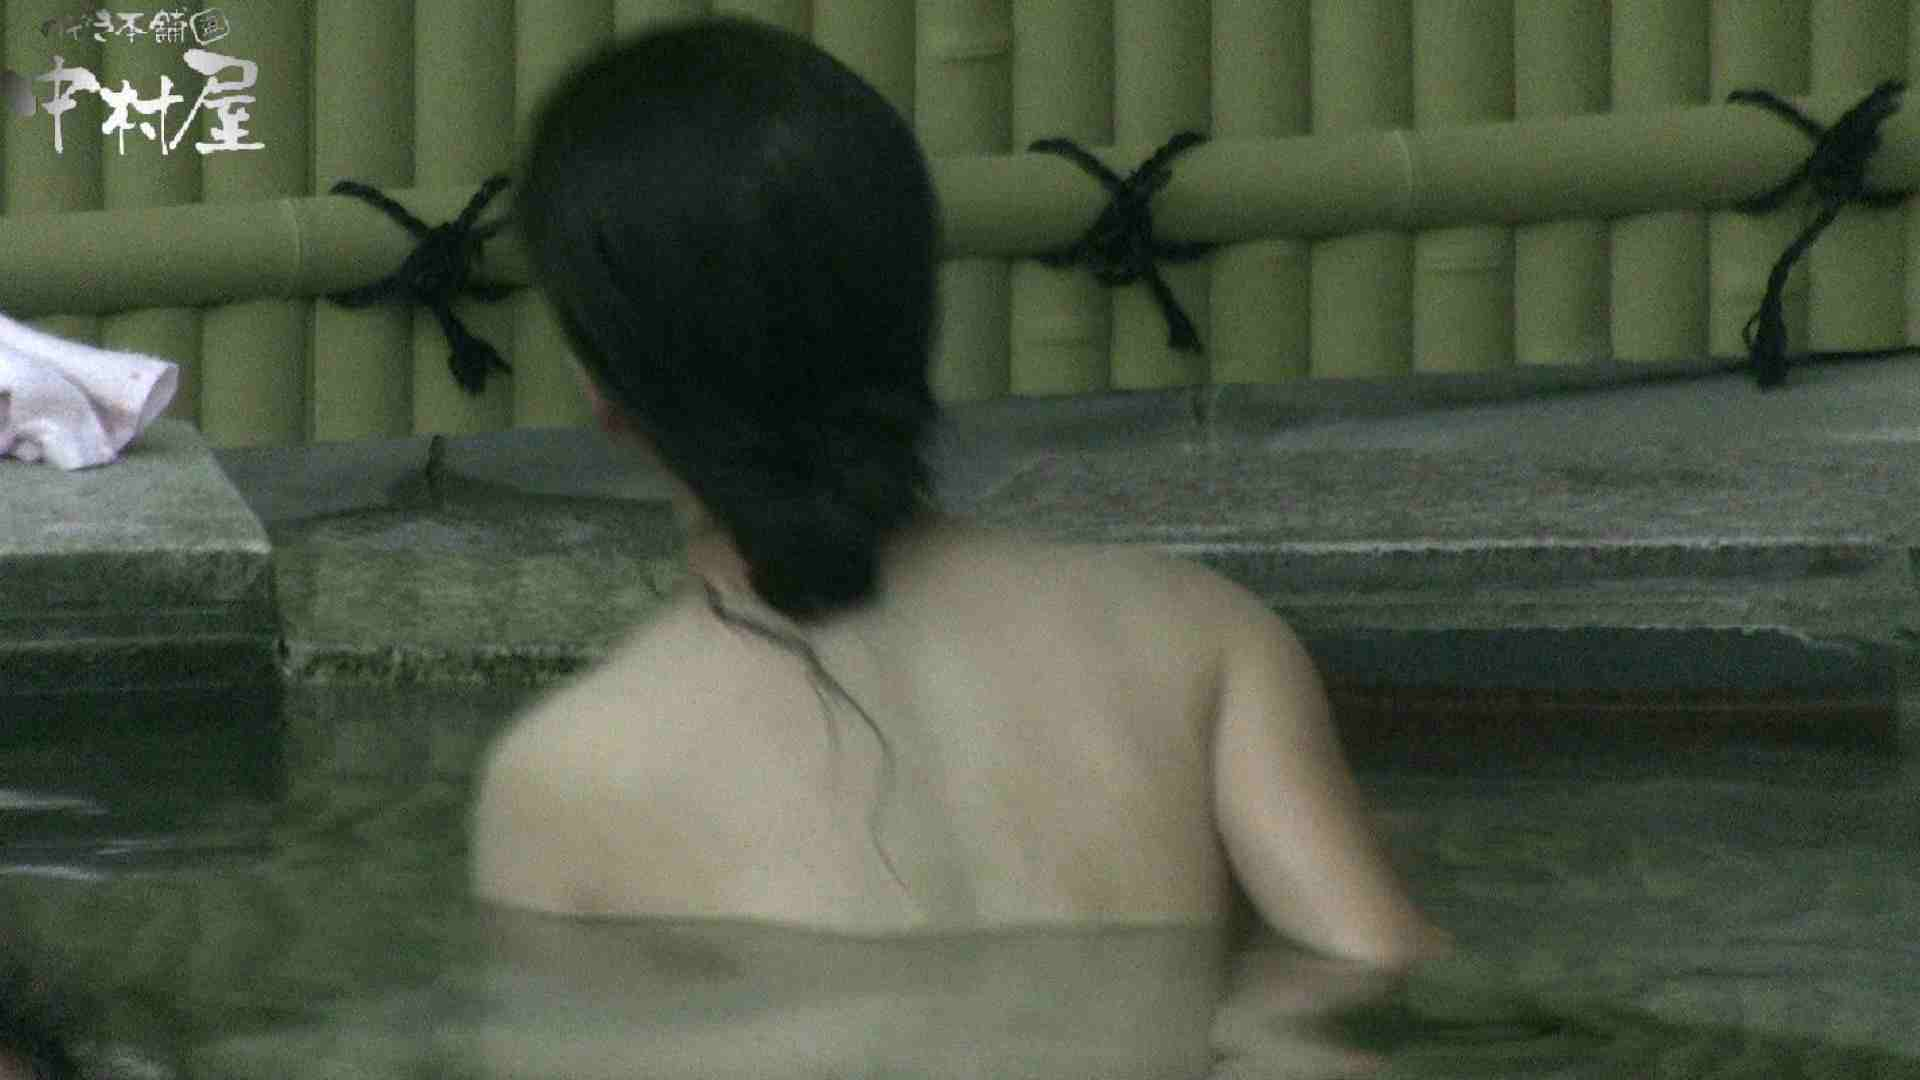 Aquaな露天風呂Vol.904 美しいOLの裸体 オメコ動画キャプチャ 103pic 8